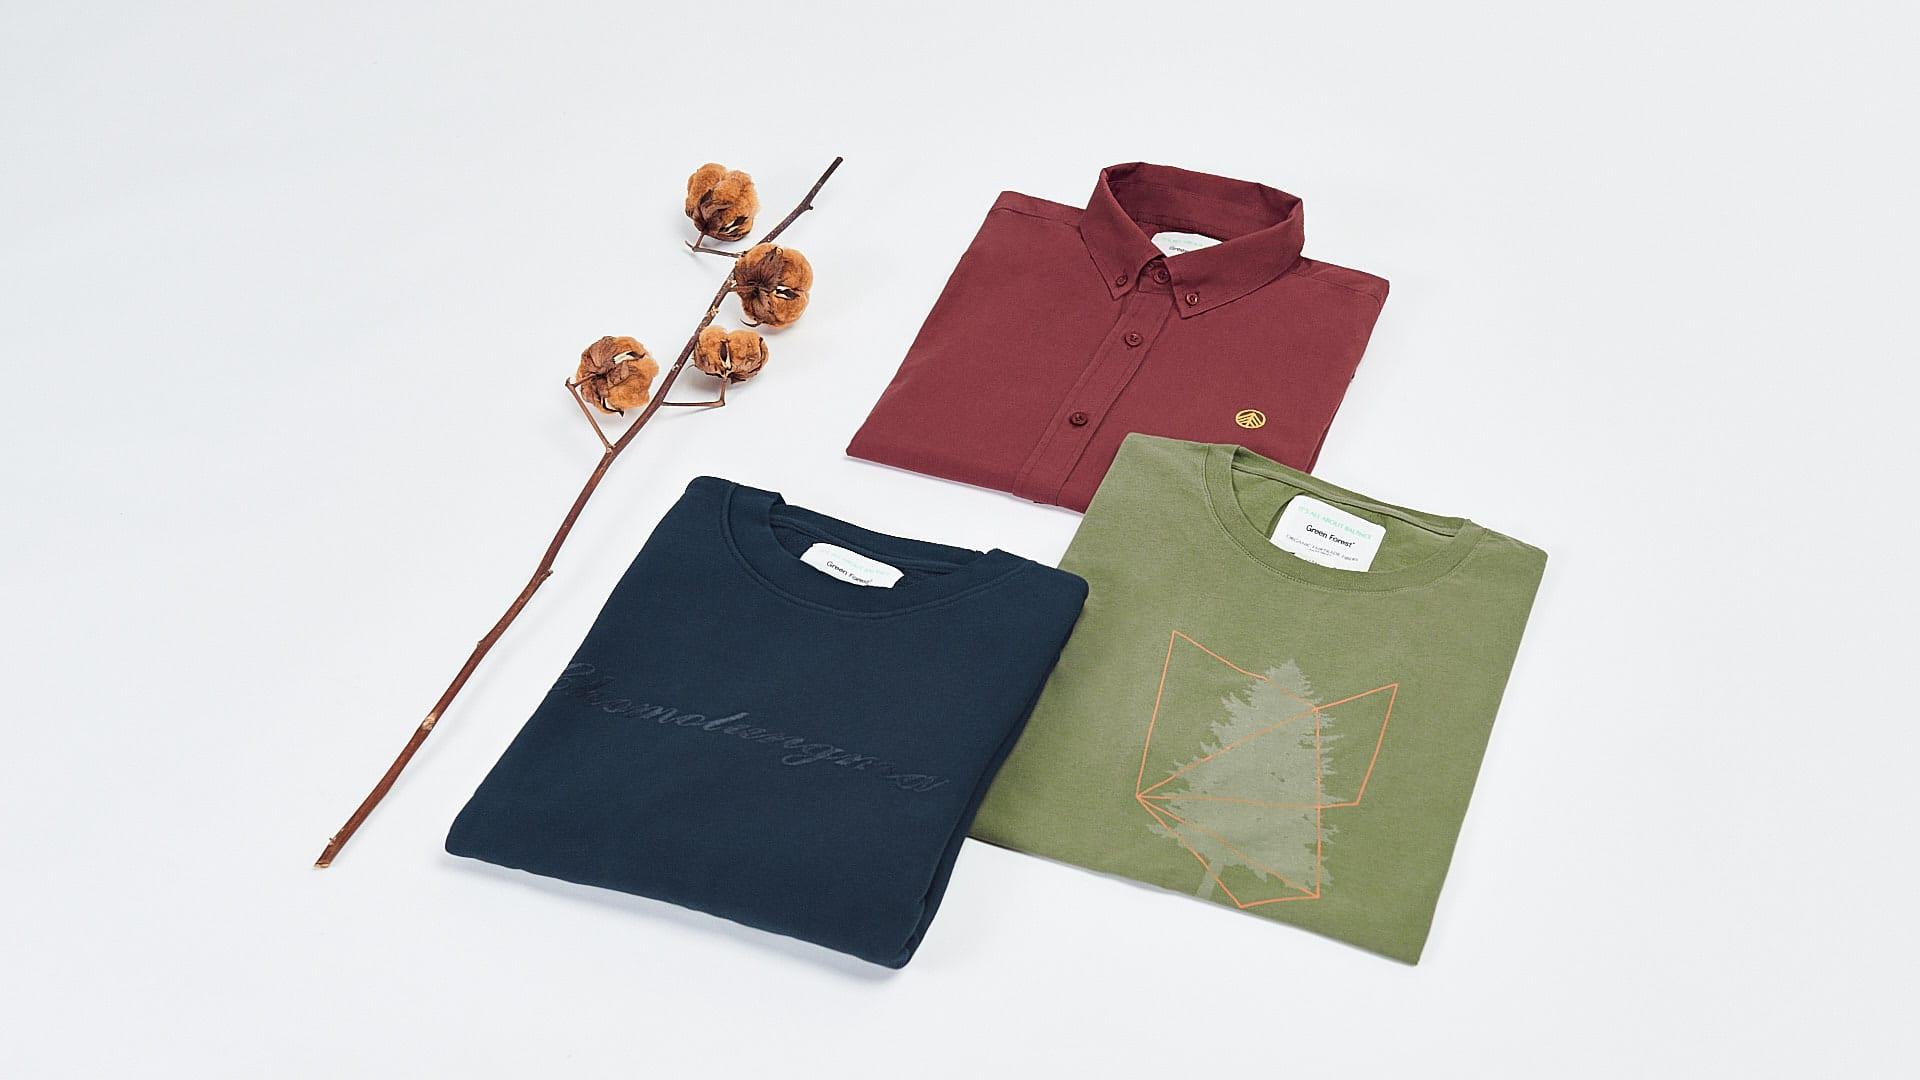 ropa algodon ecologico green forest wear